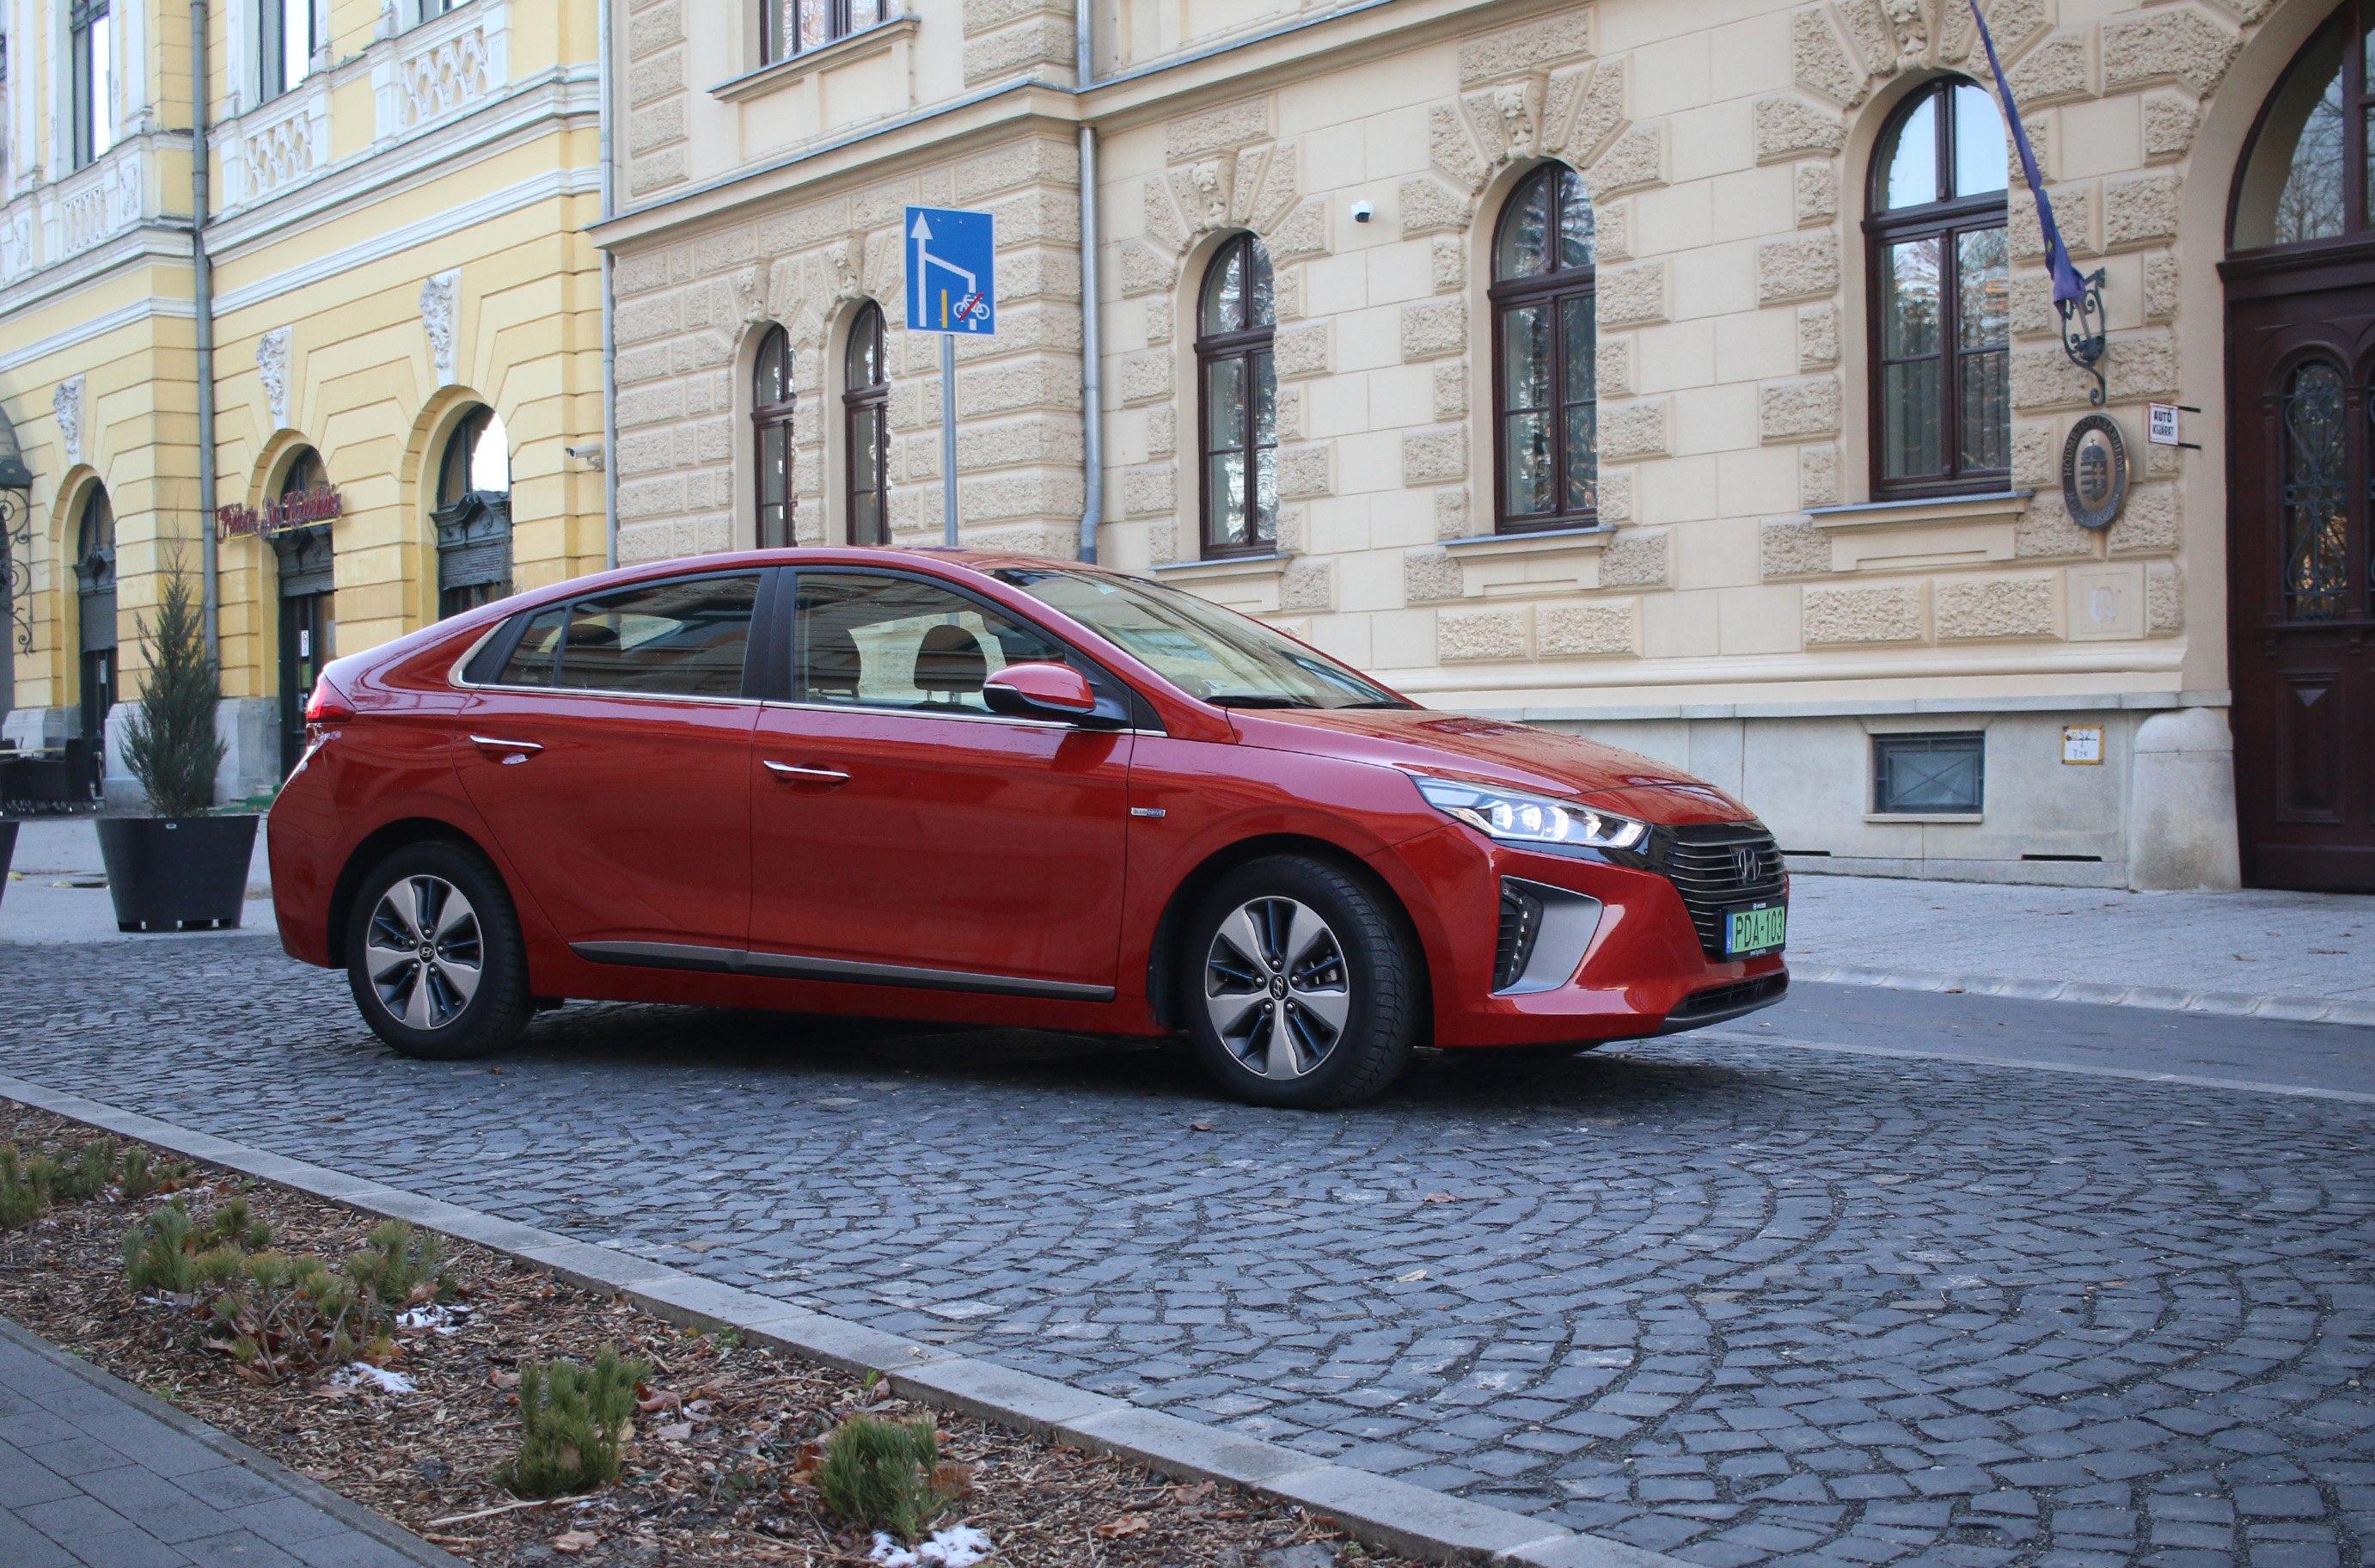 Hyundai_IONIQ_PHEV_test_3_zoldautok